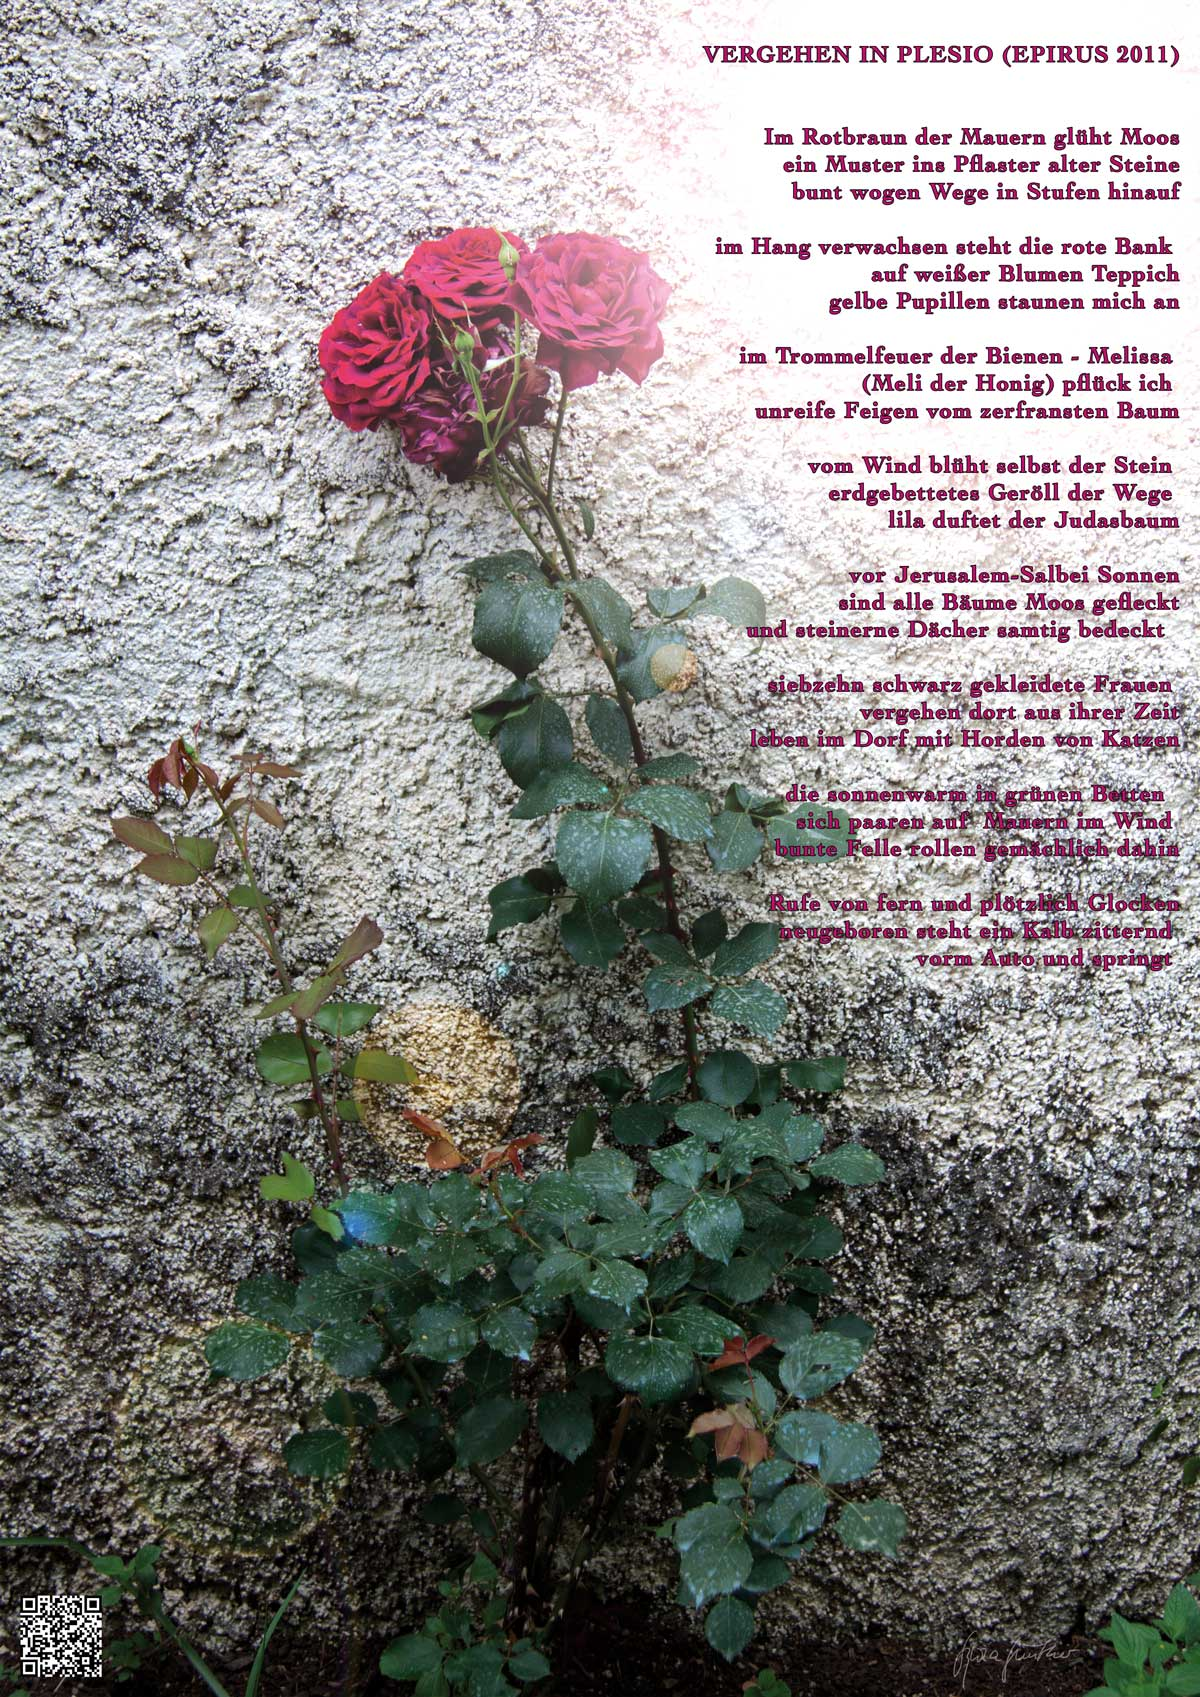 Soundpics: 80 Vergehen in Plesio (Epirus 2011)